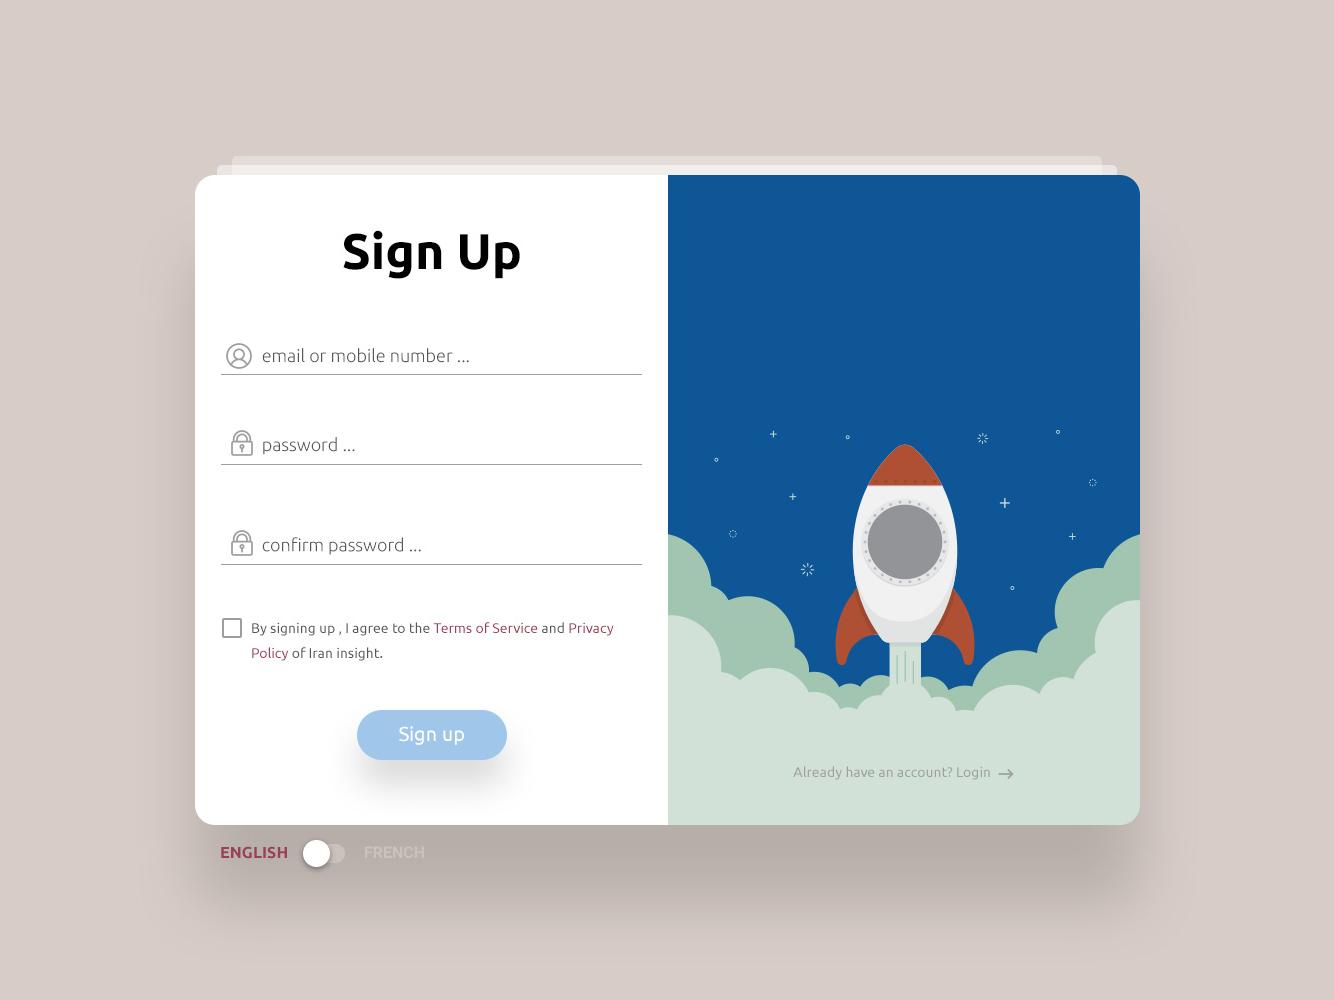 Sign Up Form application signup page form signup form signup 001 dailyui